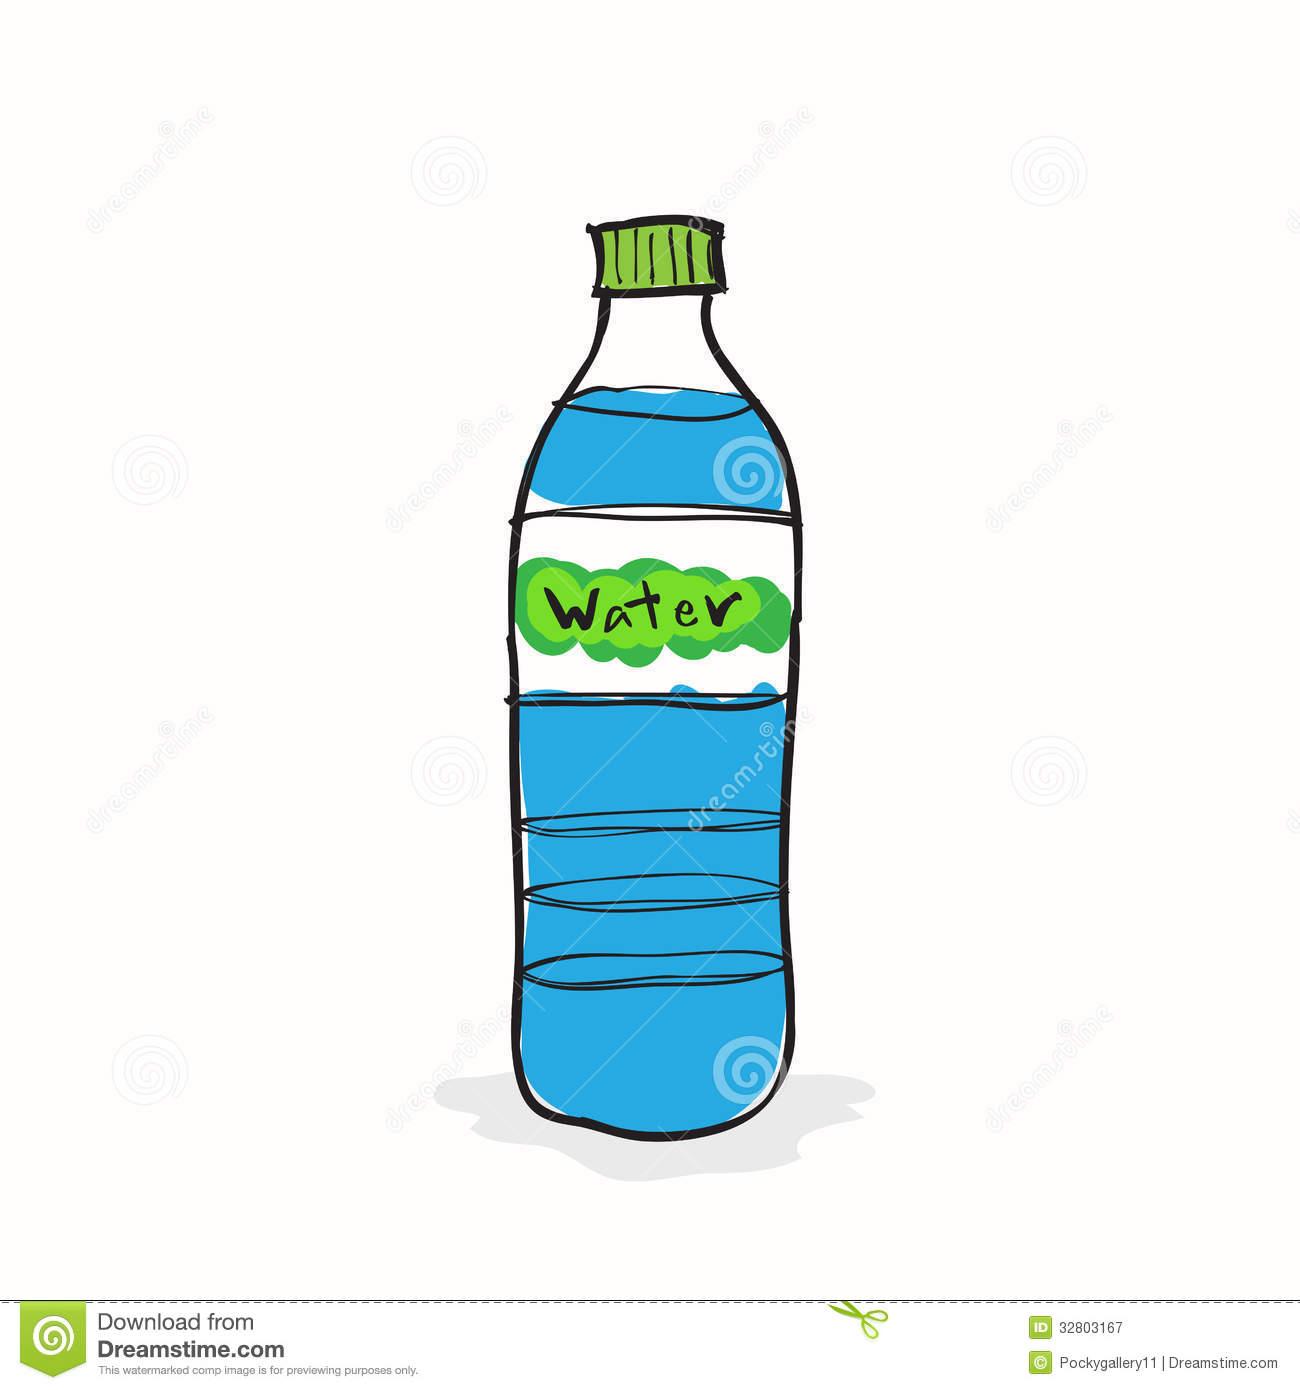 Water Bottle Clipart-water bottle clipart-11